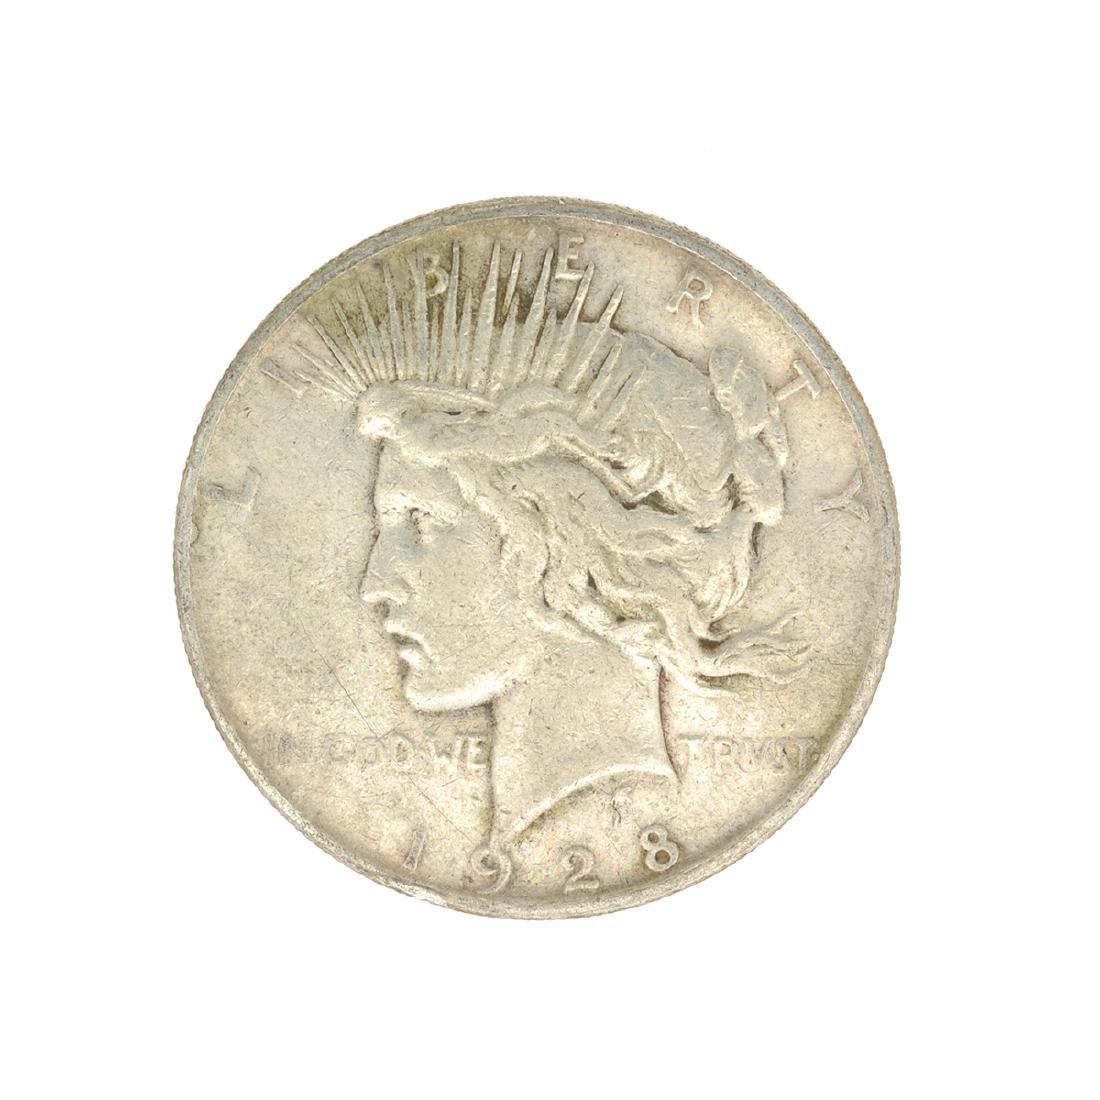 Rare 1928-S U.S. Peace Type Silver Dollar